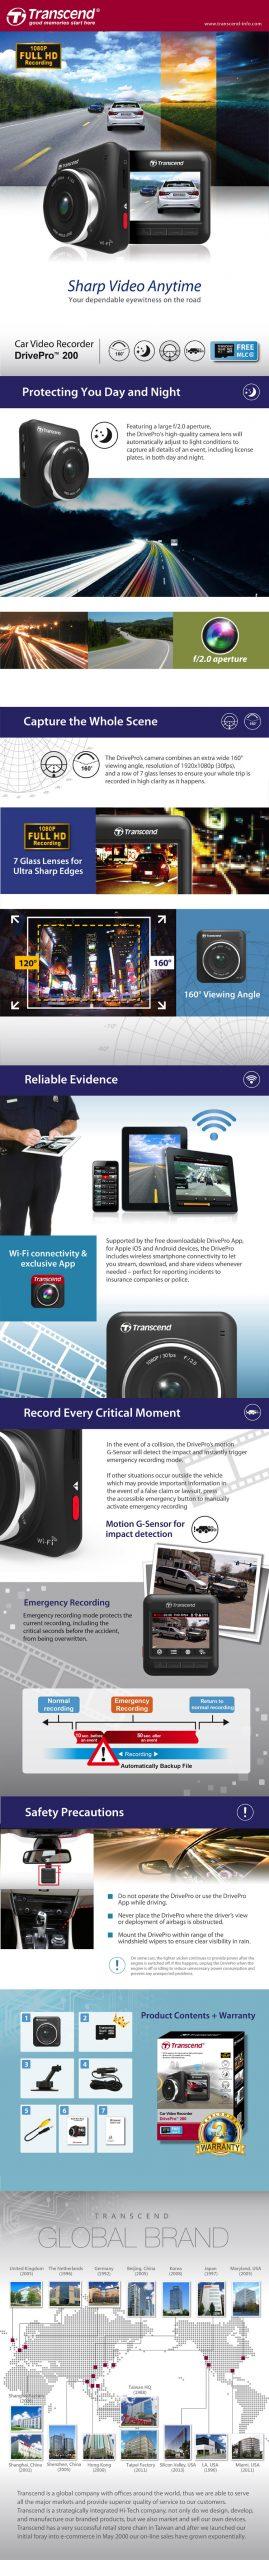 TRANSCEND DRIVE PRO 200 CAR VIDEO RECORDER FULL HD-437